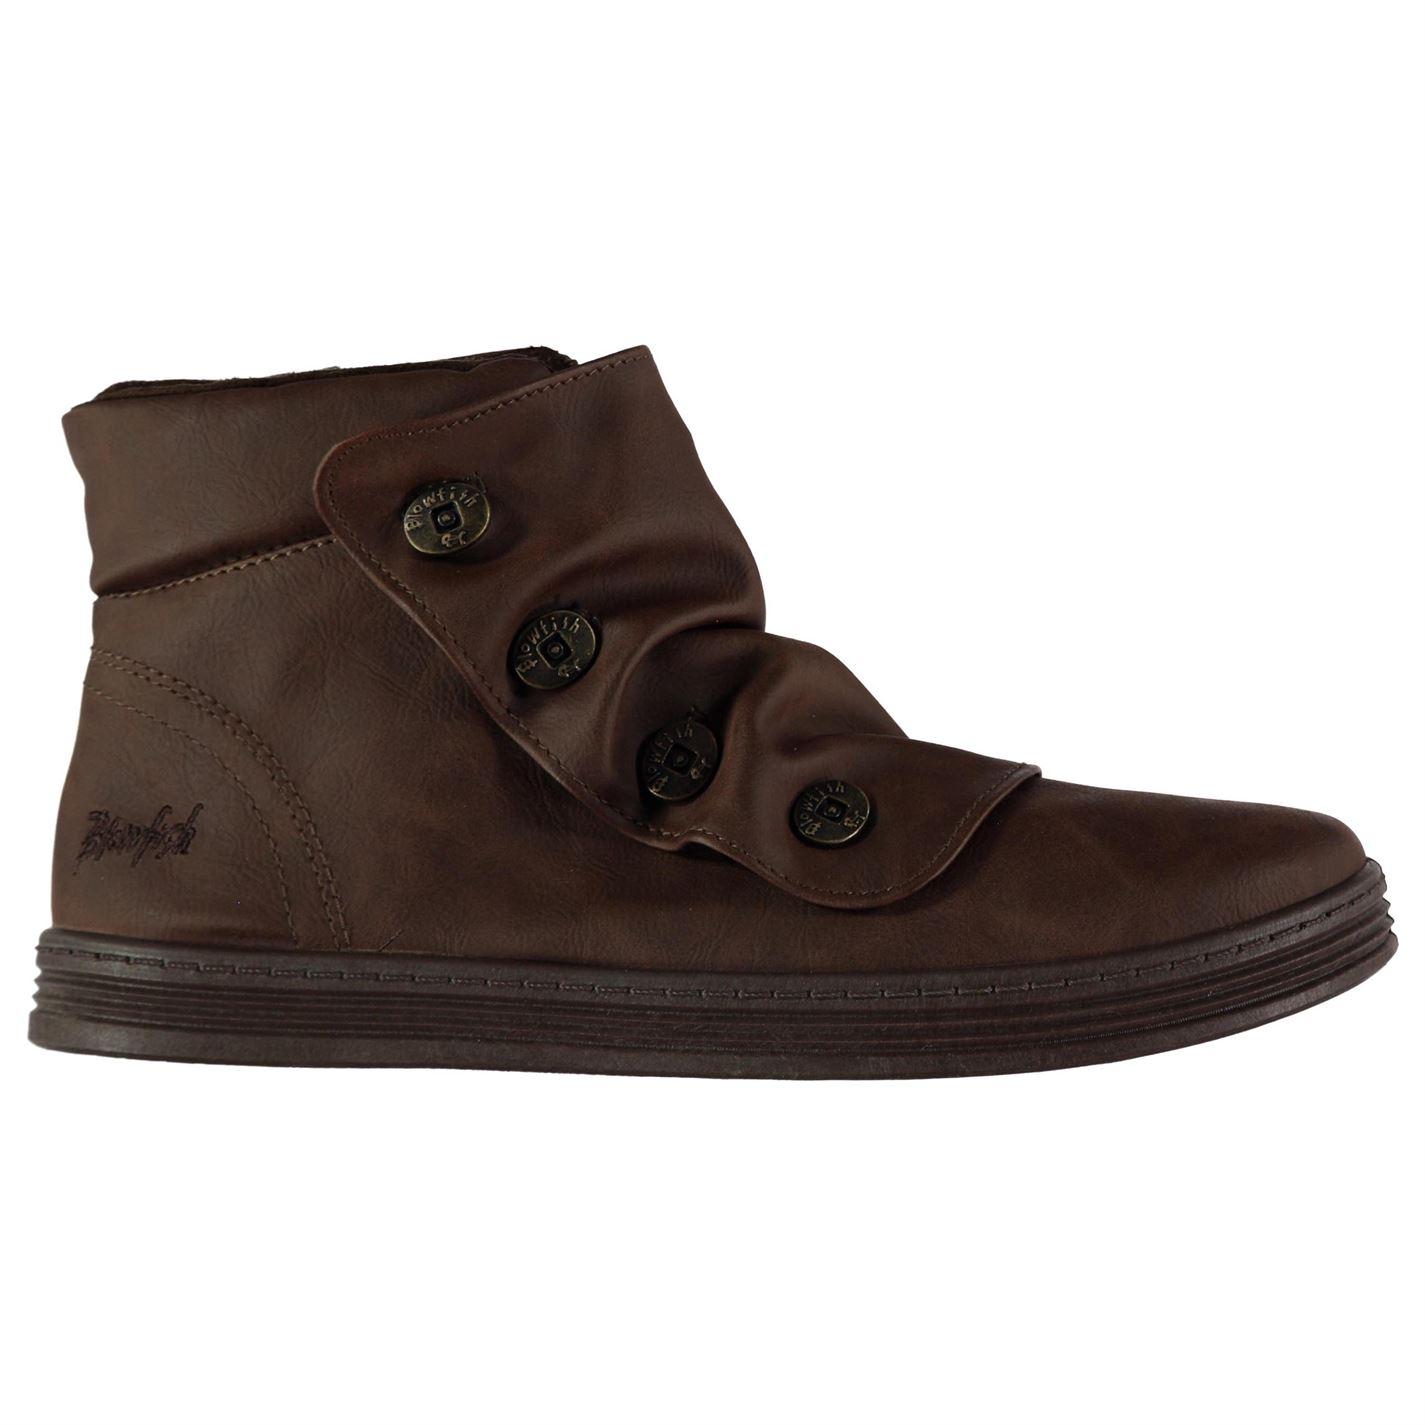 Blowfish Fumio Boots